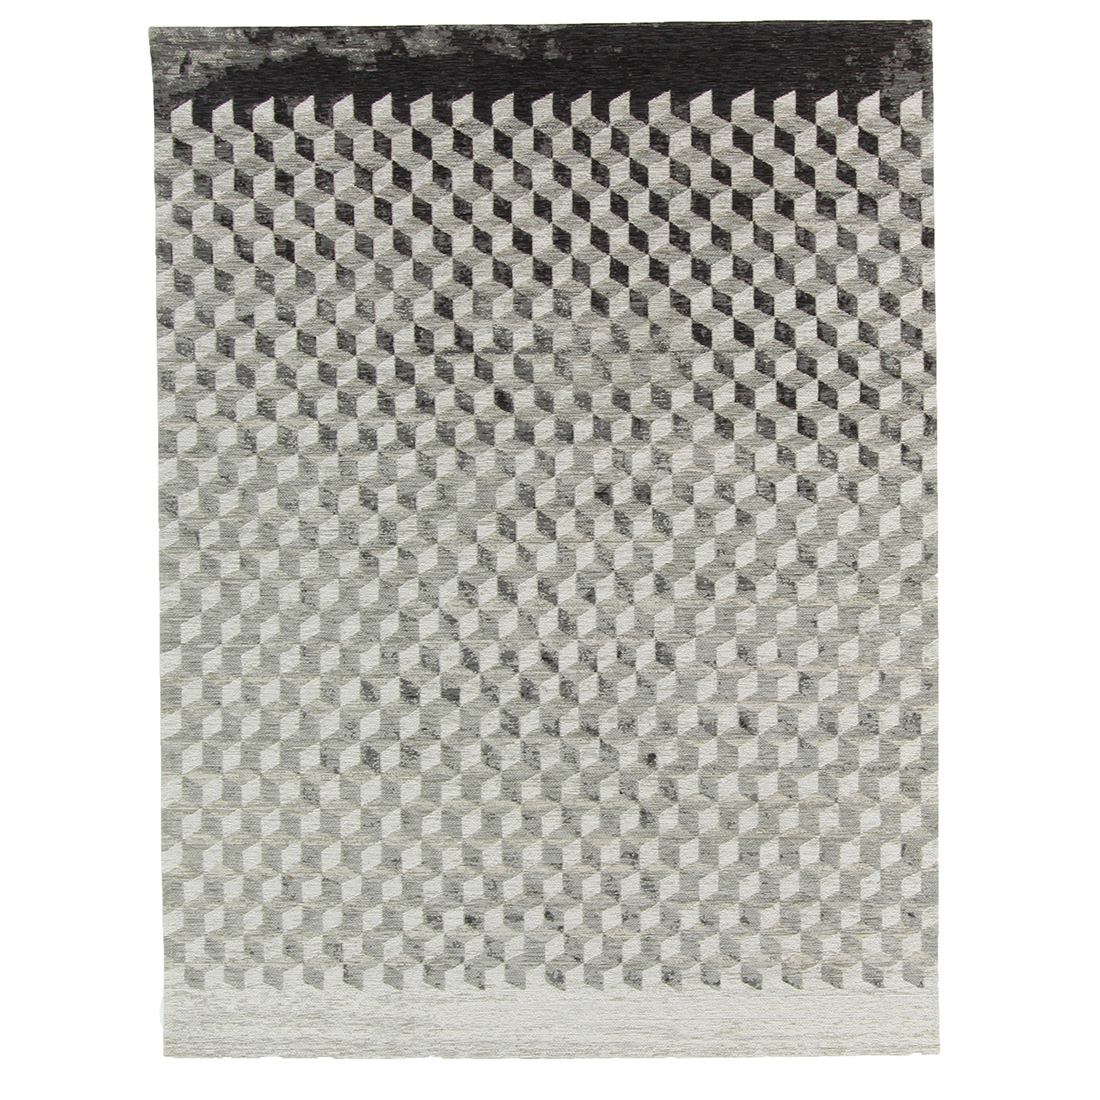 Vloerkleed Brinker Geometrics Unifi Grey | 170 x 230 cm